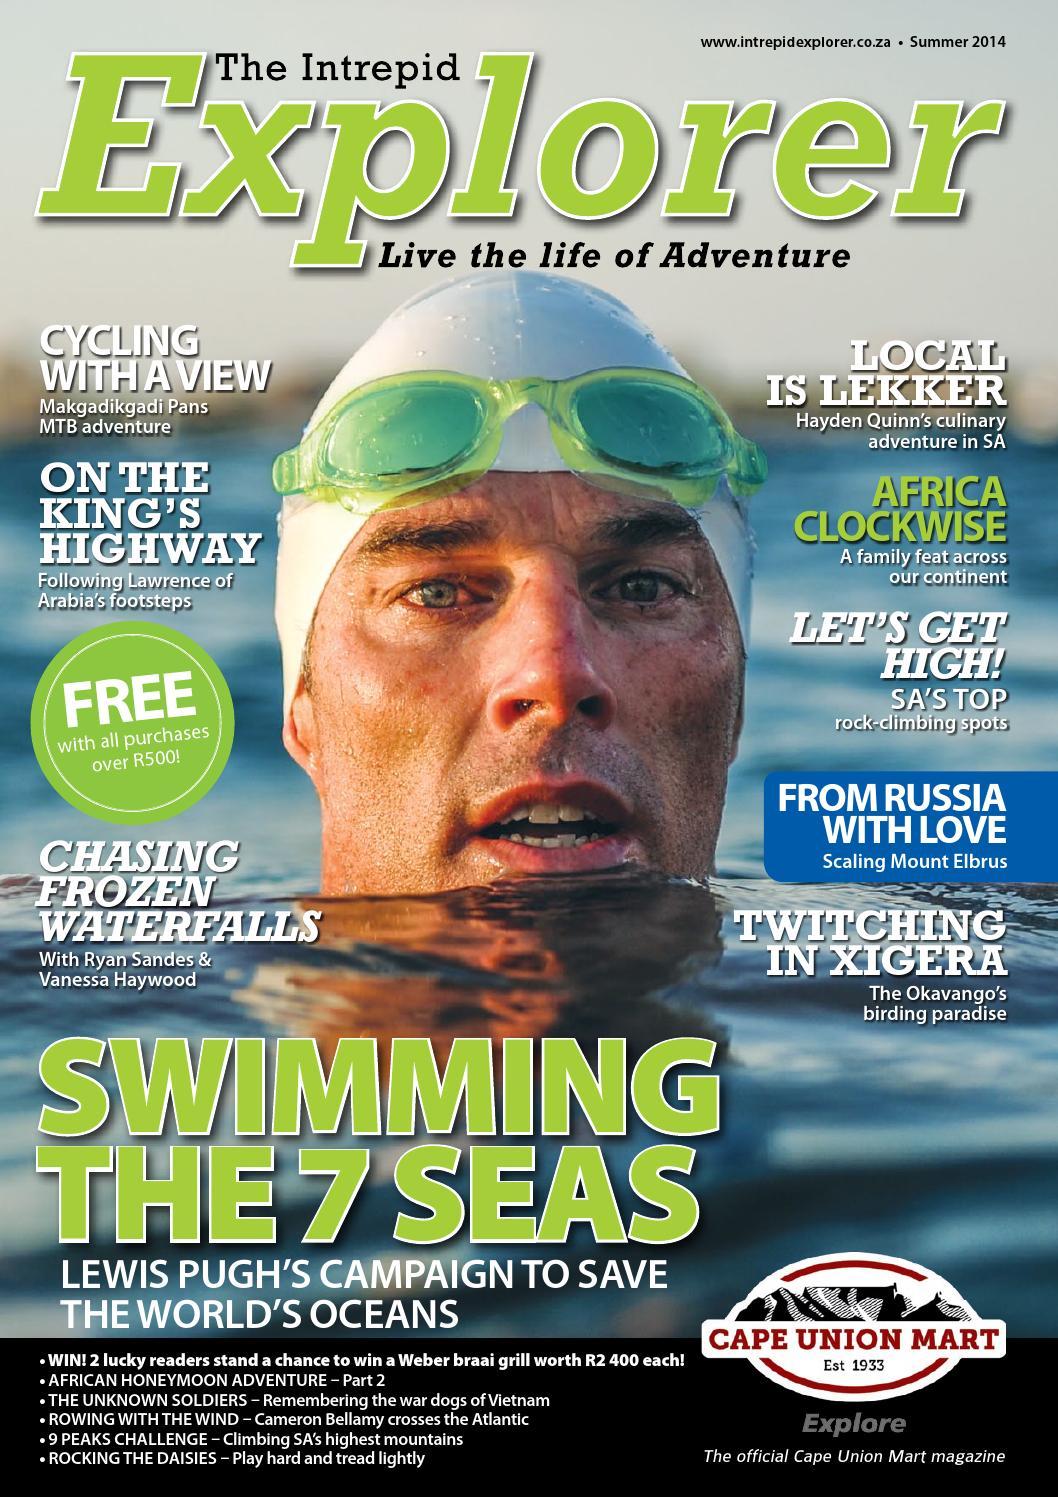 949b91a9b1f The Intrepid Explorer magazine - Spring 2015 by The Intrepid ...